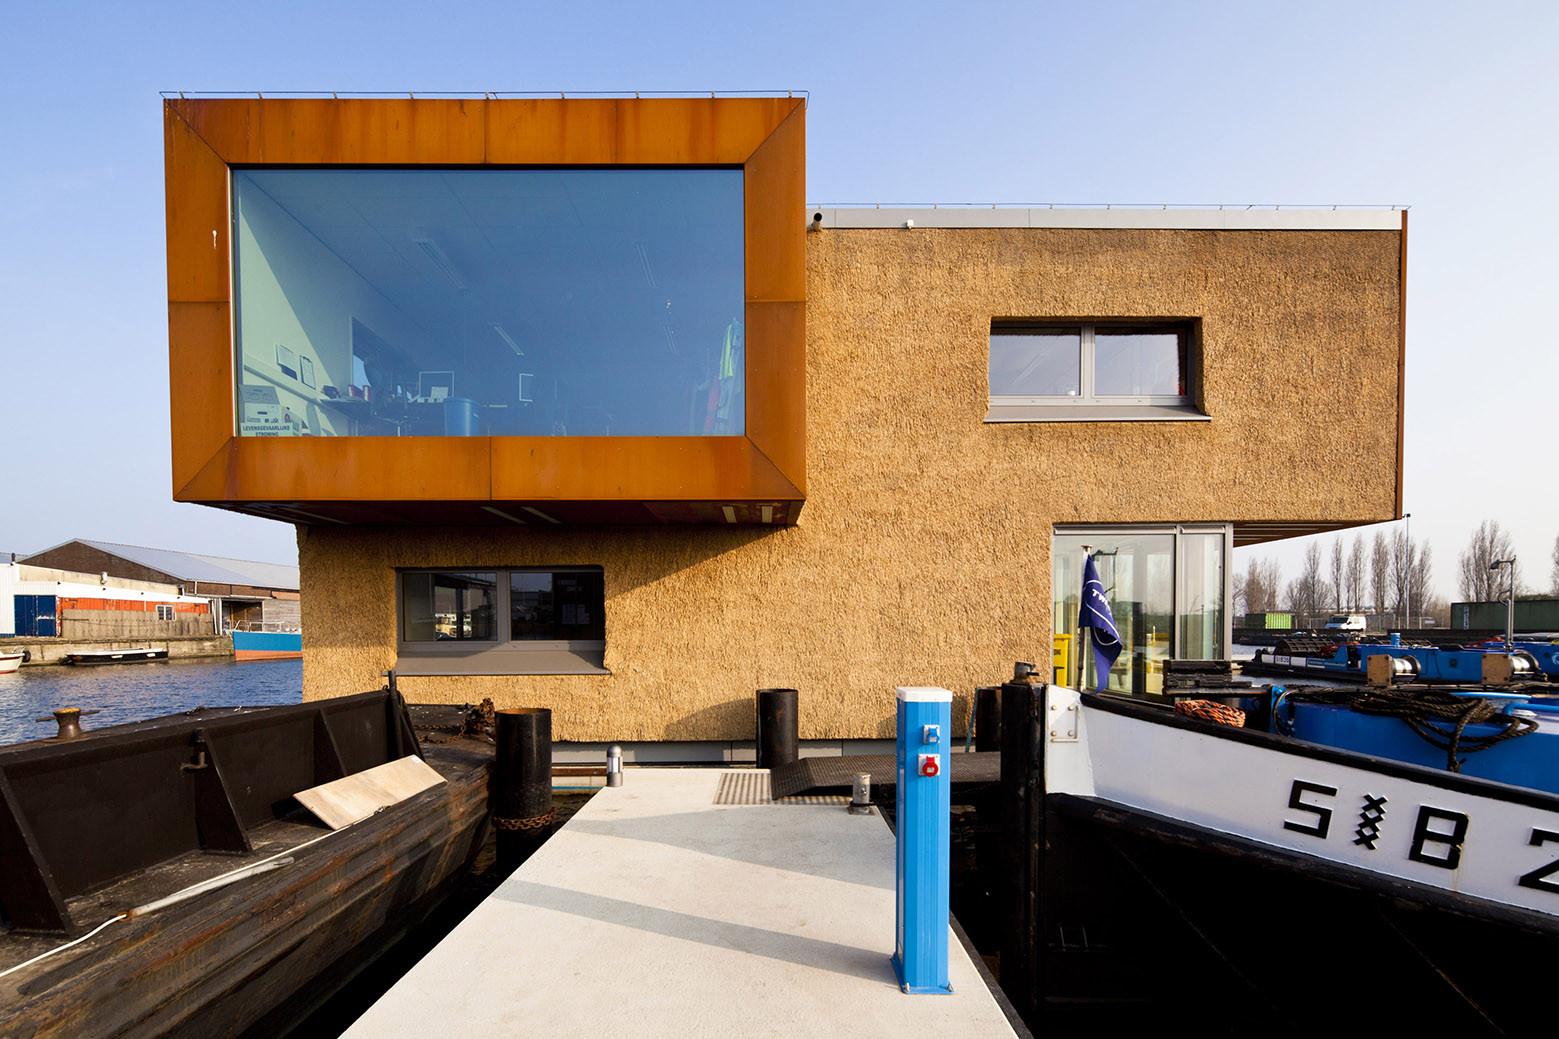 Floating Office for Waternet / Attika Architekten